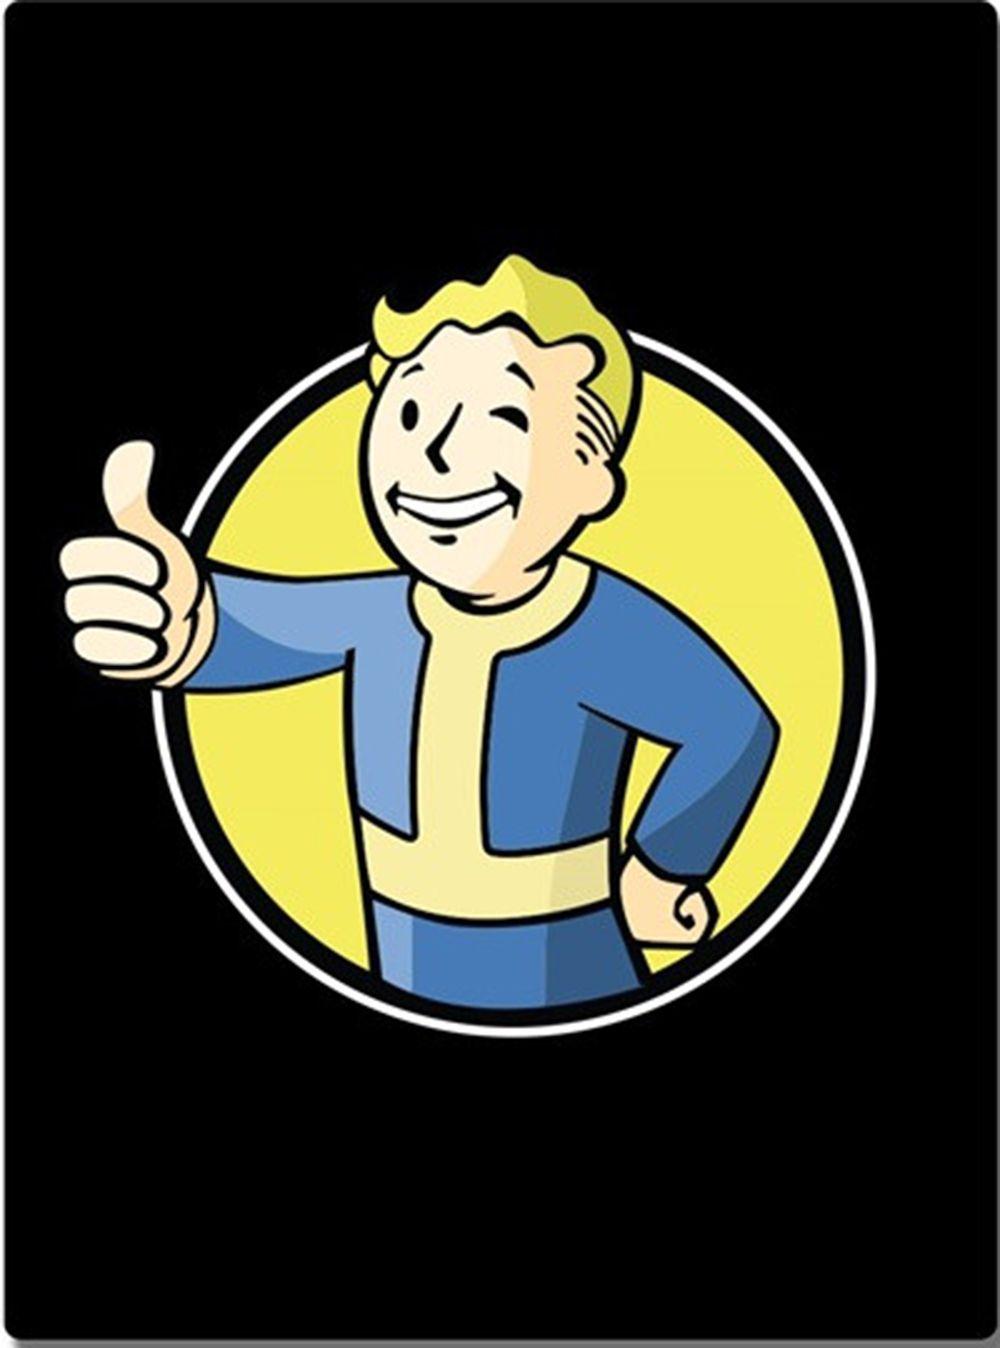 Fallout Vault Boy Black Blanket Vault boy fallout, Vault